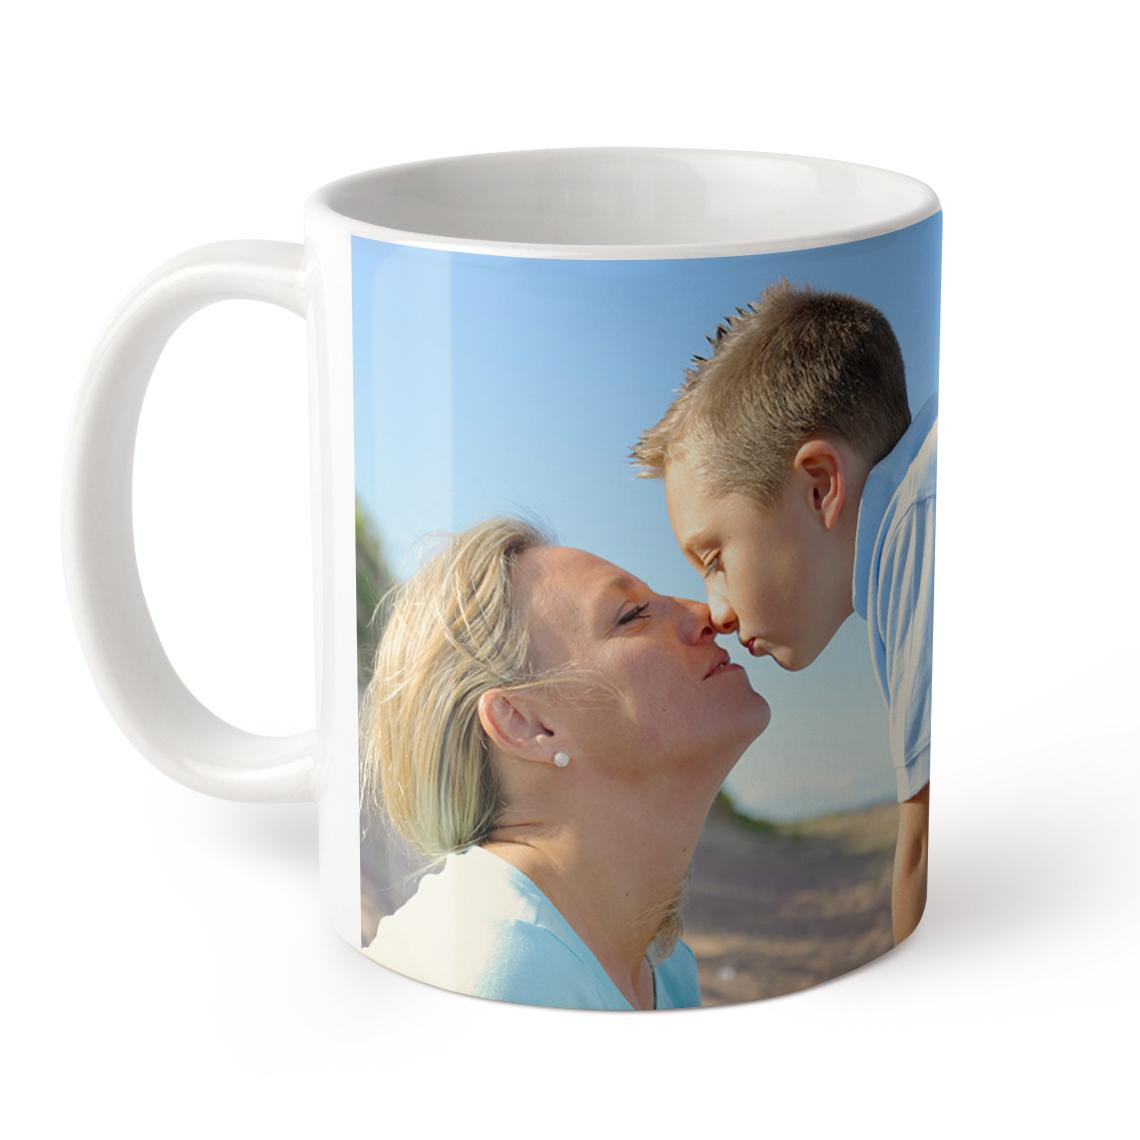 Photo Coffee Mug 11 Oz Mugs Gifts Snapfish Us